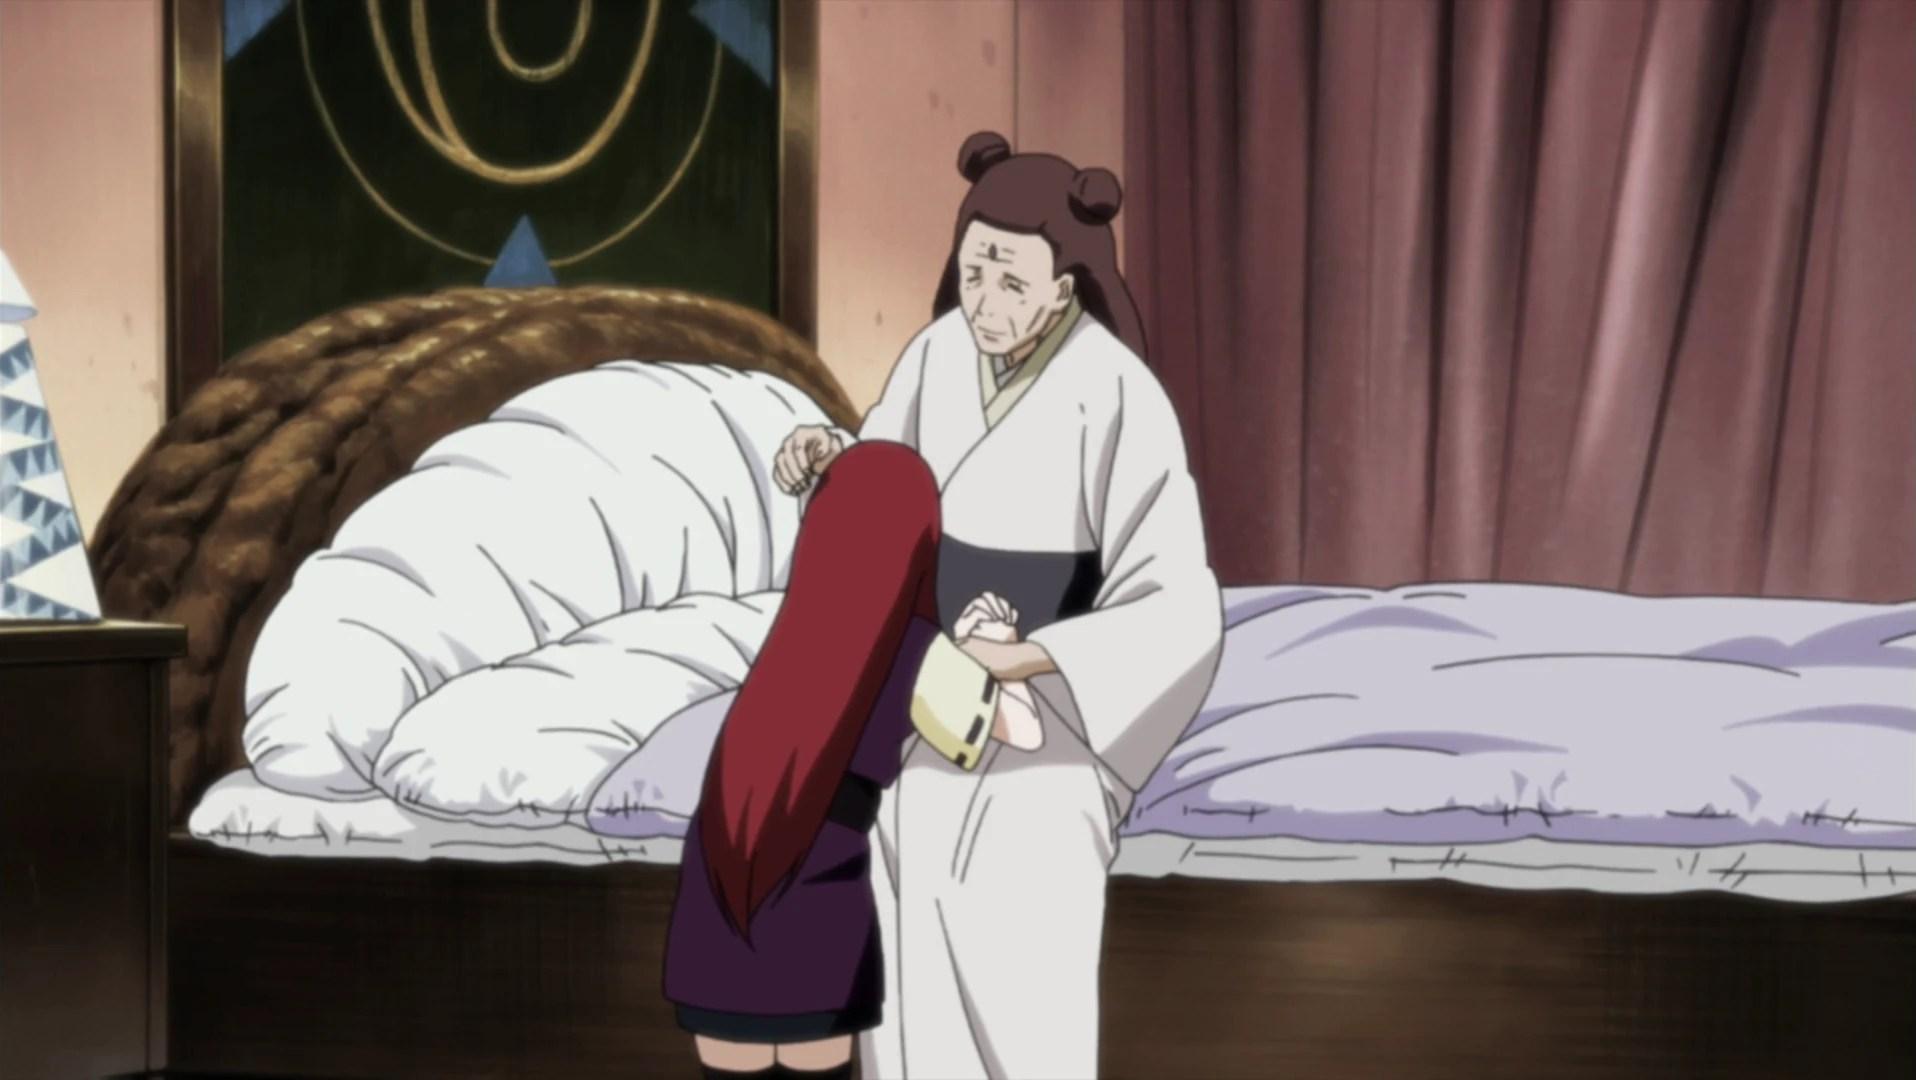 The third hokage was powerless to convince her to stay. Mito Uzumaki Narutopedia Fandom